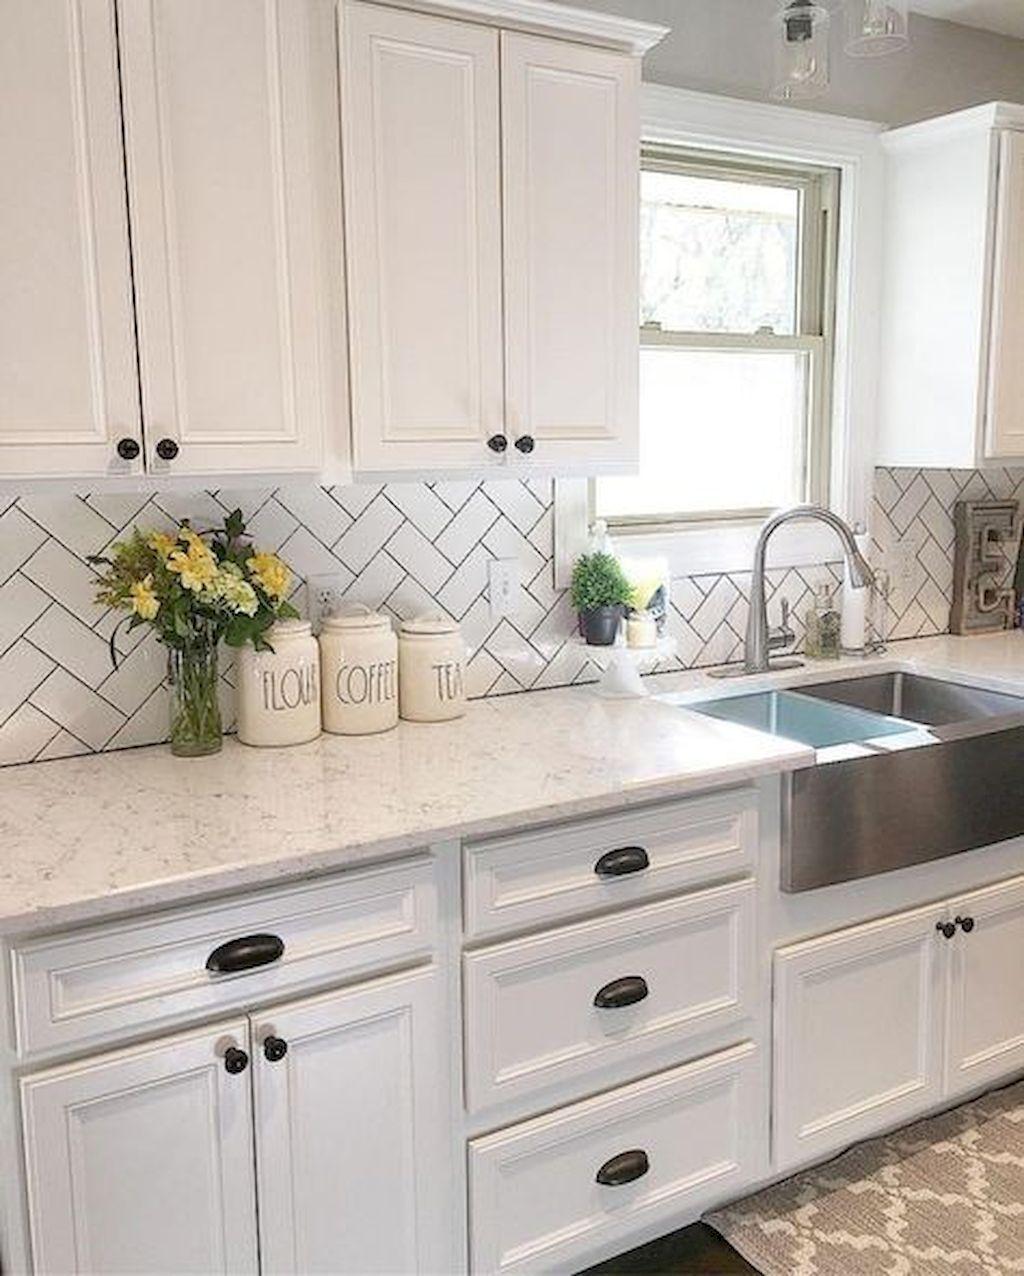 60 Fancy Farmhouse Kitchen Backsplash Decor Ideas 32 Kitchen